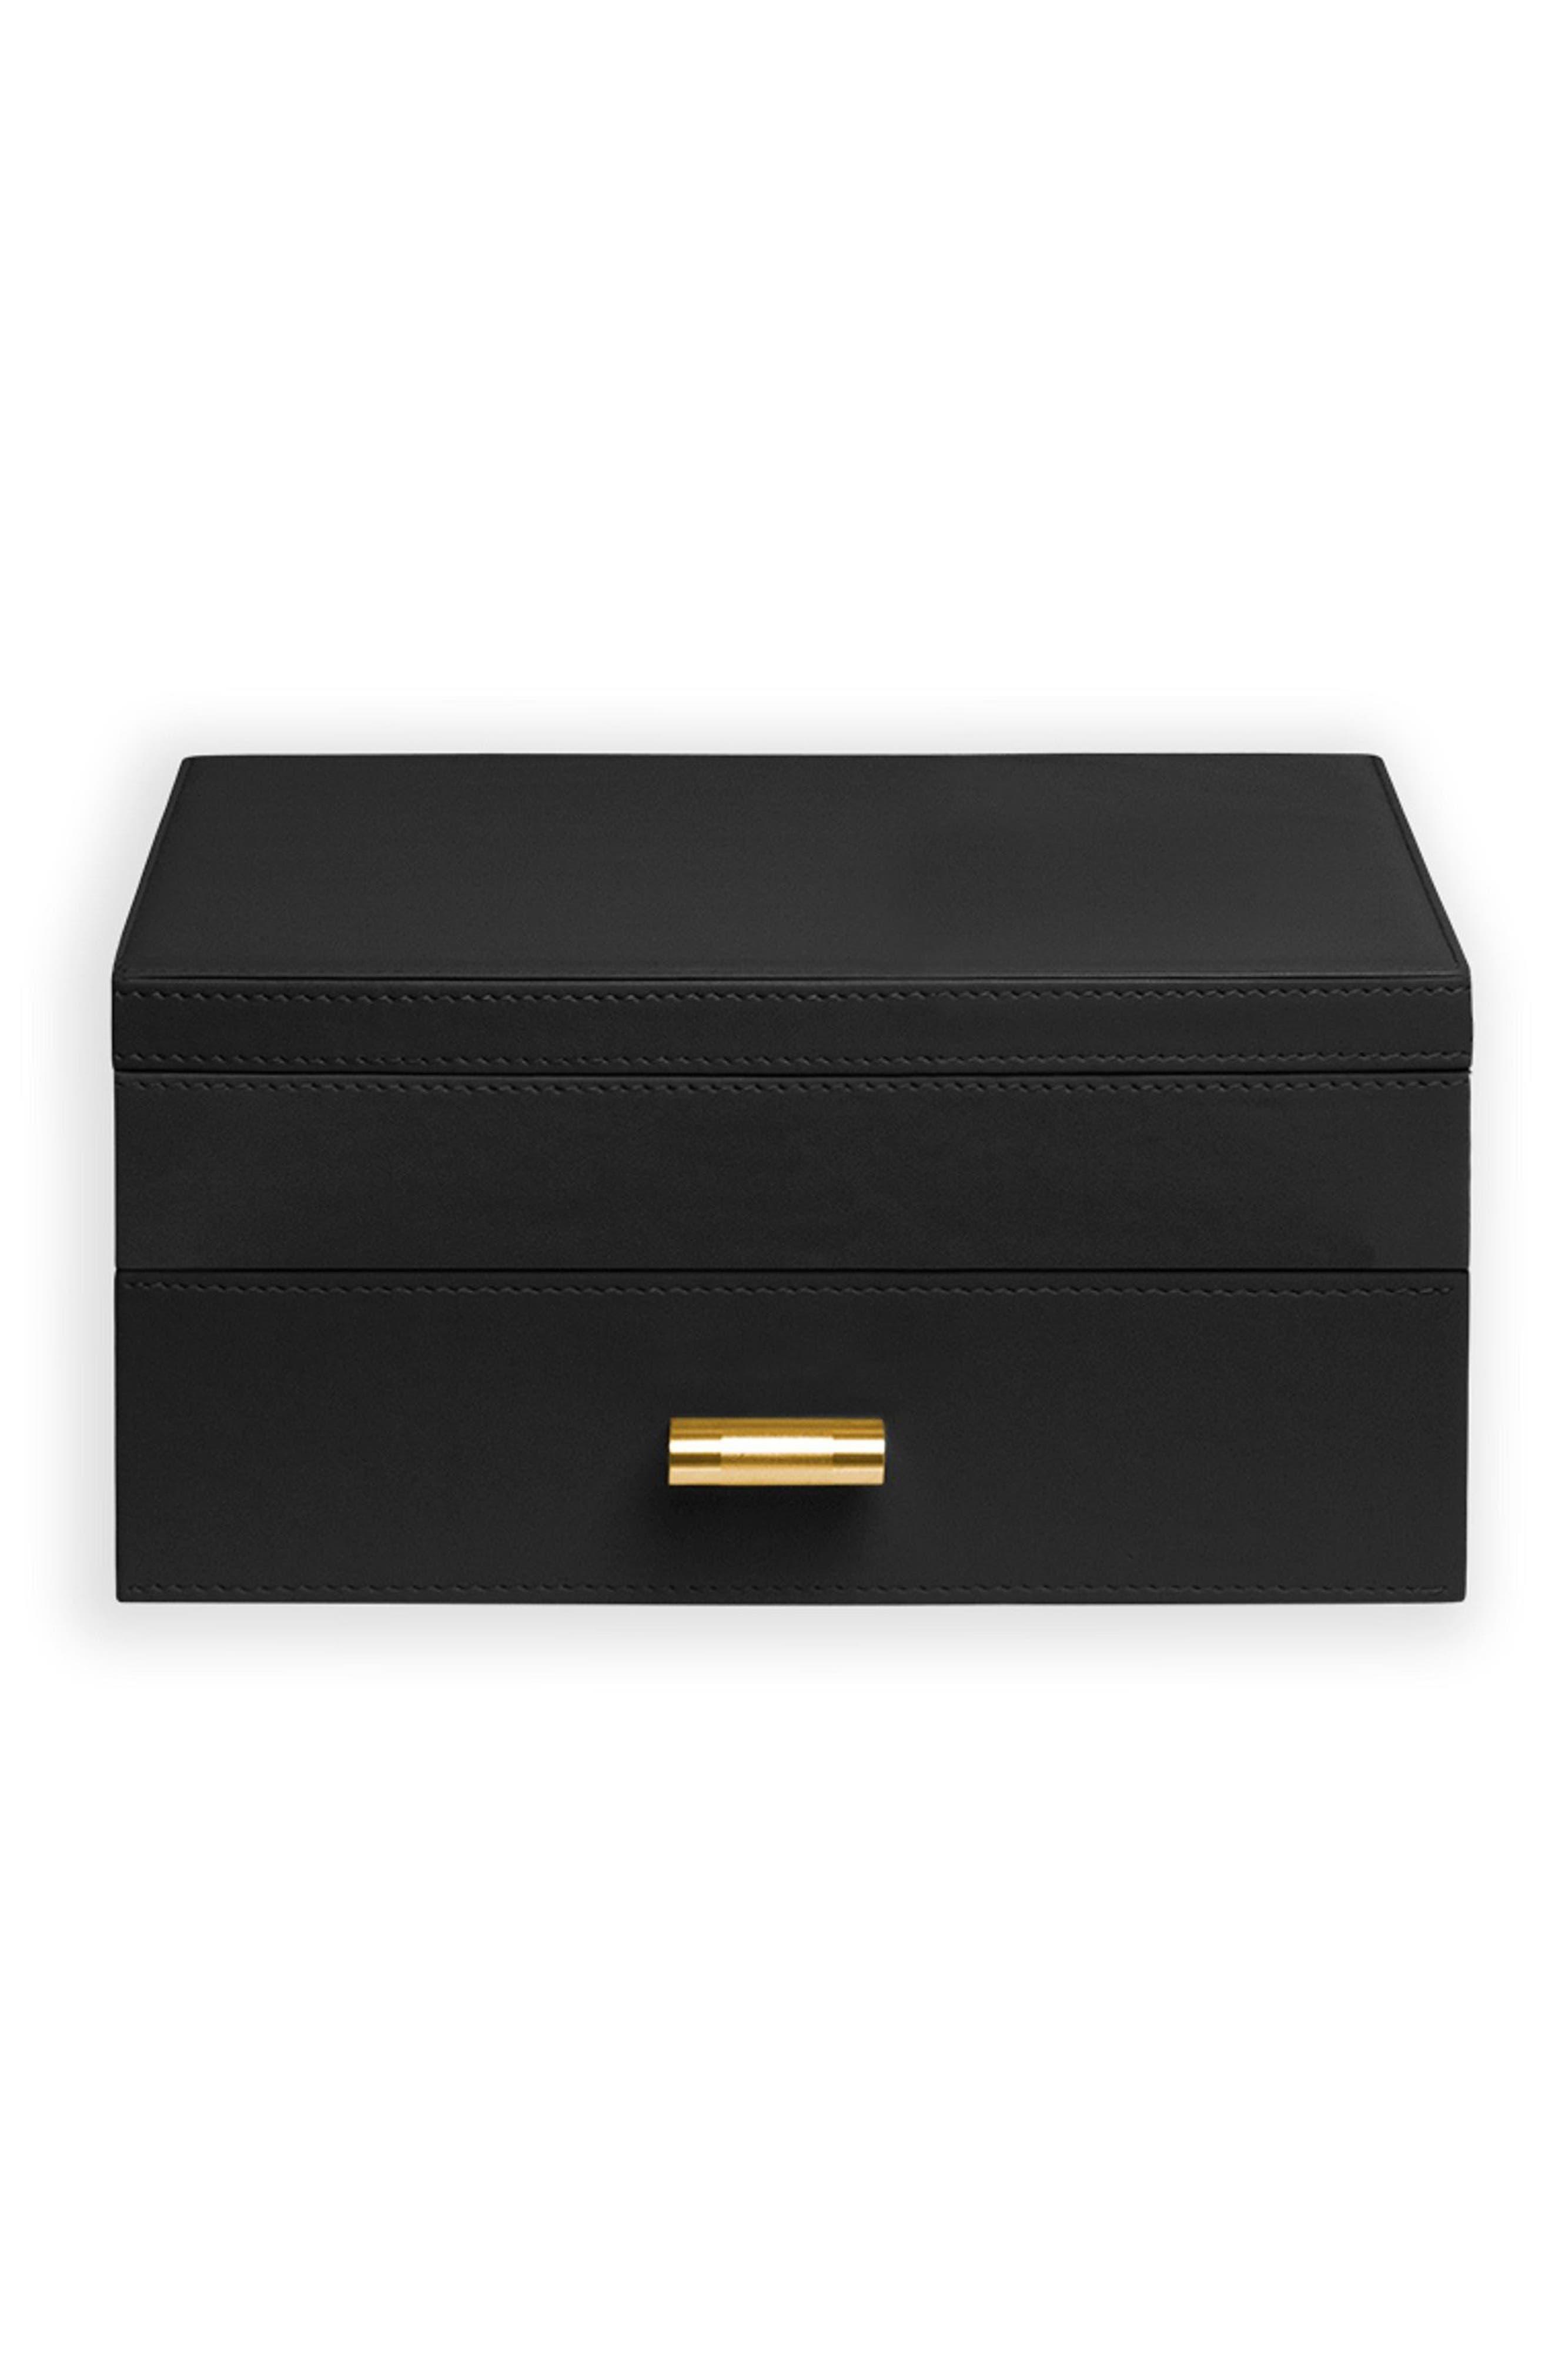 Medium Jewelry Box,                             Main thumbnail 1, color,                             BLACK/ IVORY